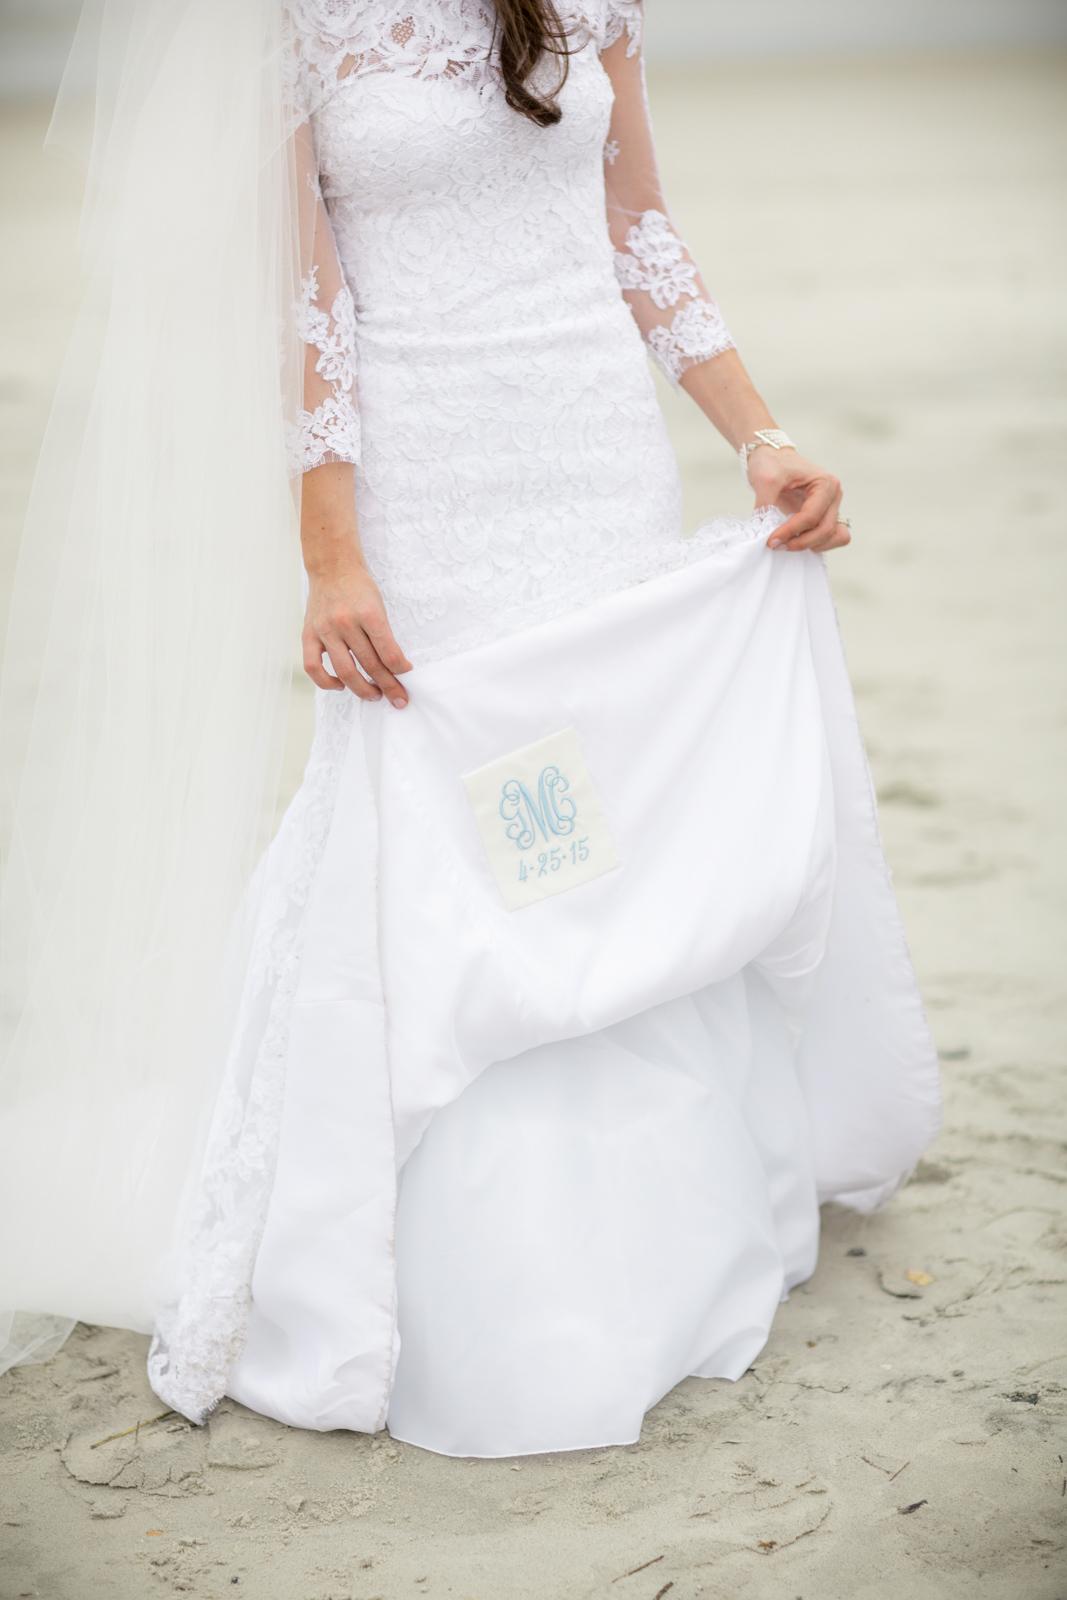 Figure eight island wedding-26.jpg